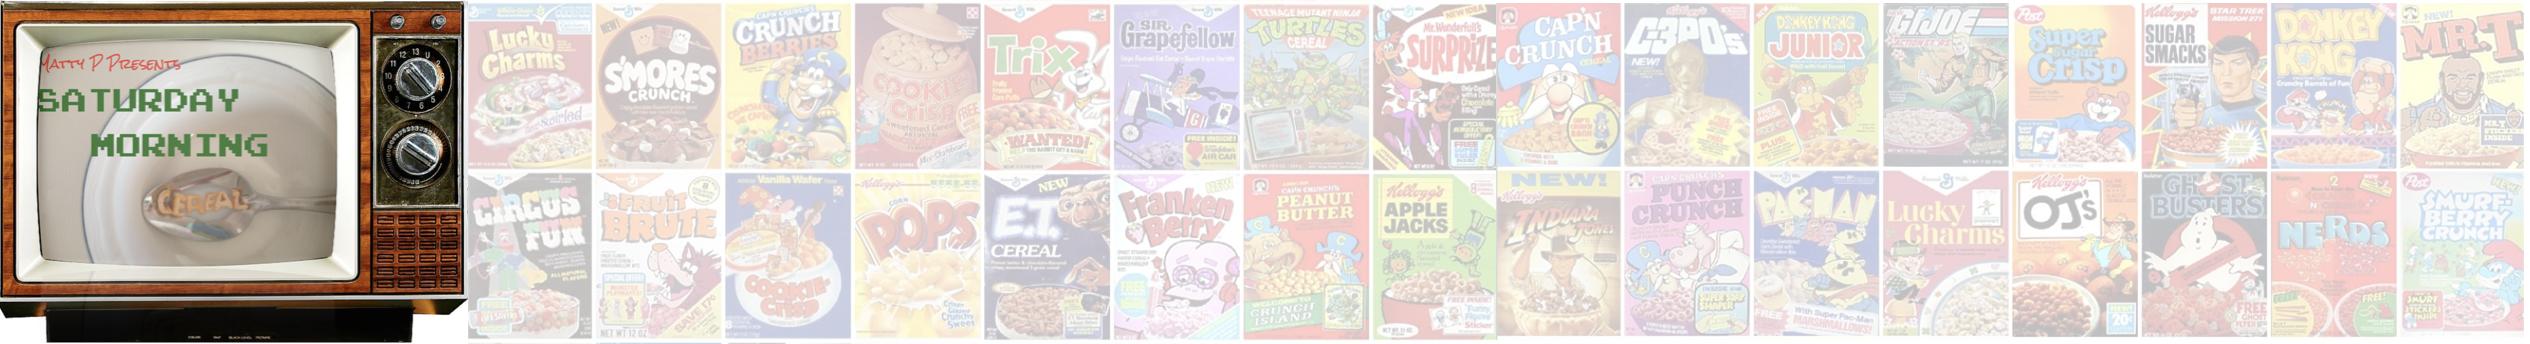 Matty P Presents: Saturday Morning Cereal